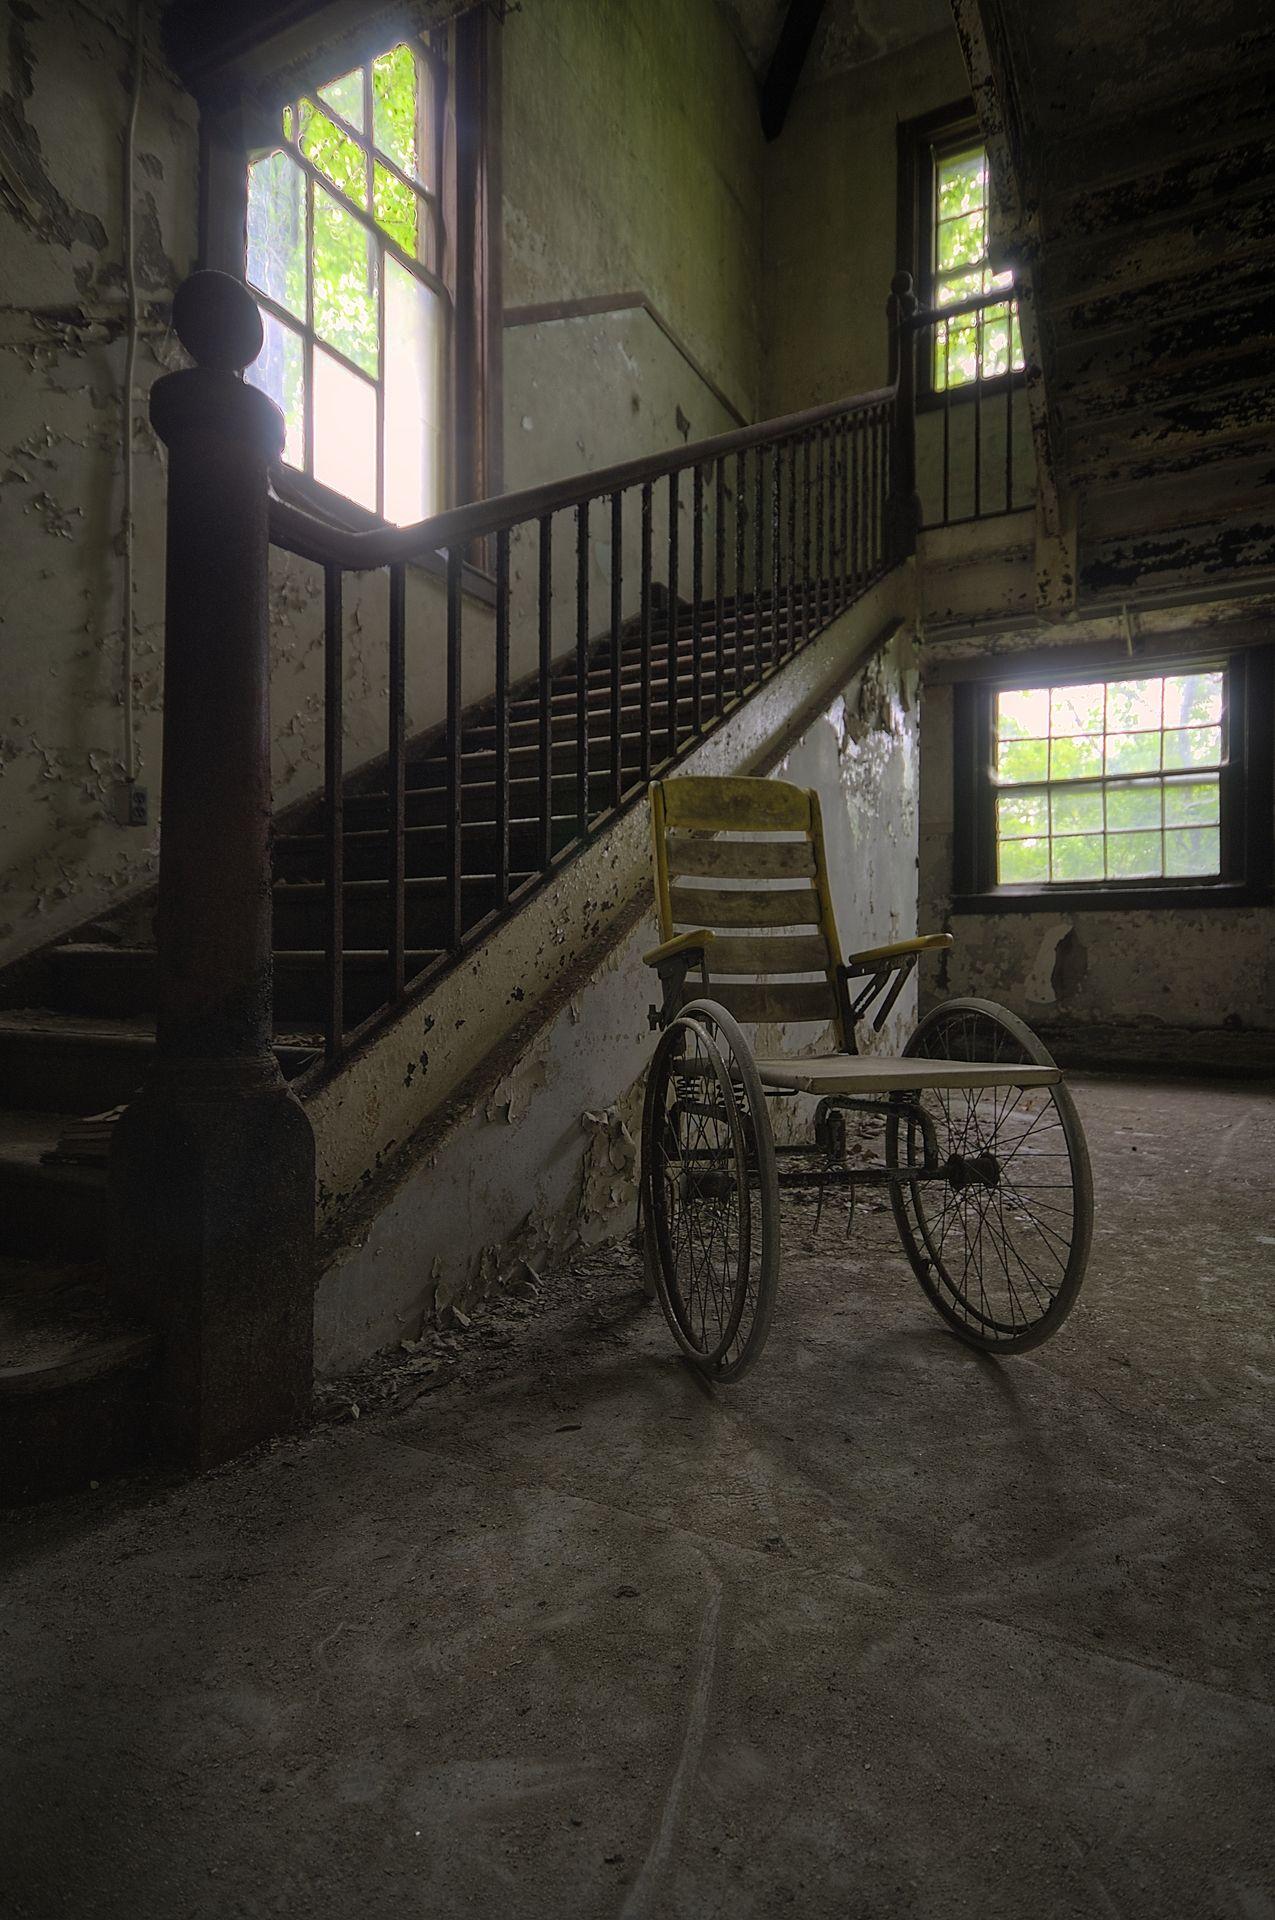 Abandoned wheelchair | ghostpast | Pinterest | Abandoned, Abandoned ...